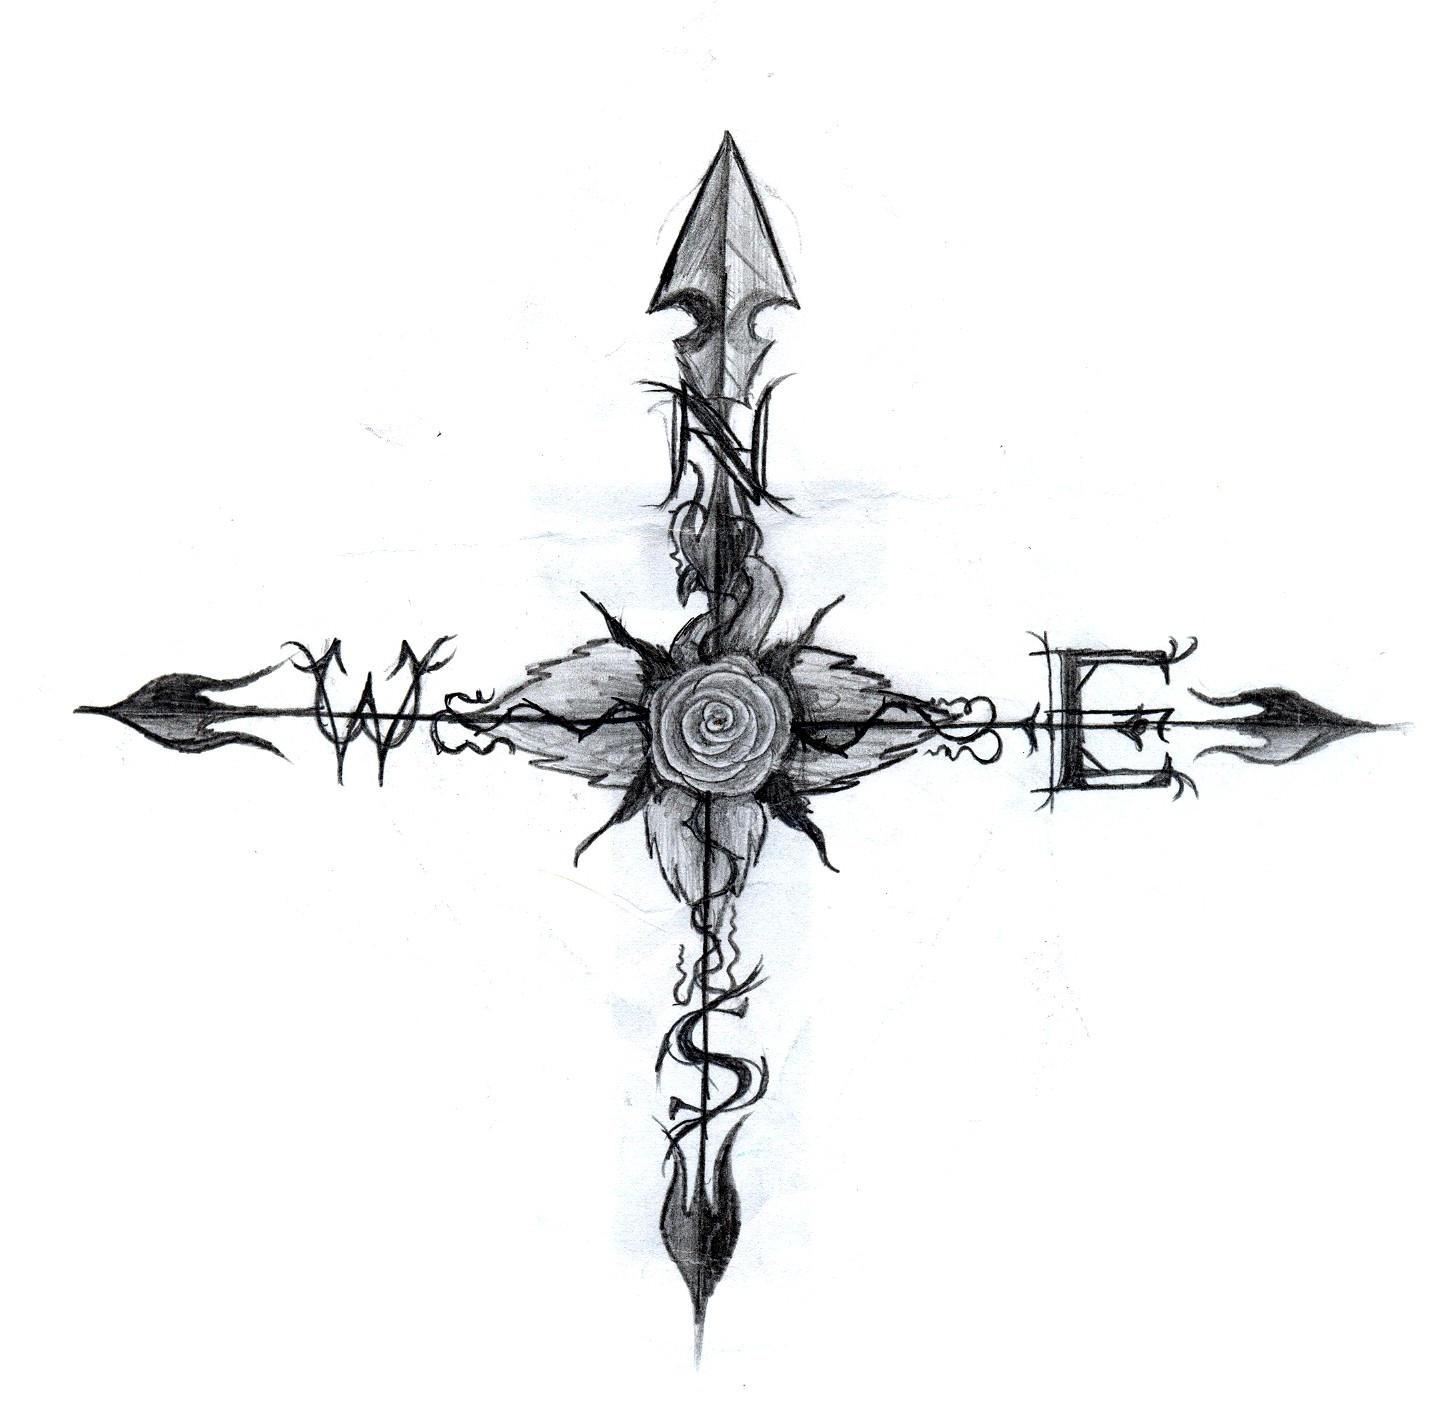 A True Compass 'Rose' By Xdyingtolivex On DeviantArt